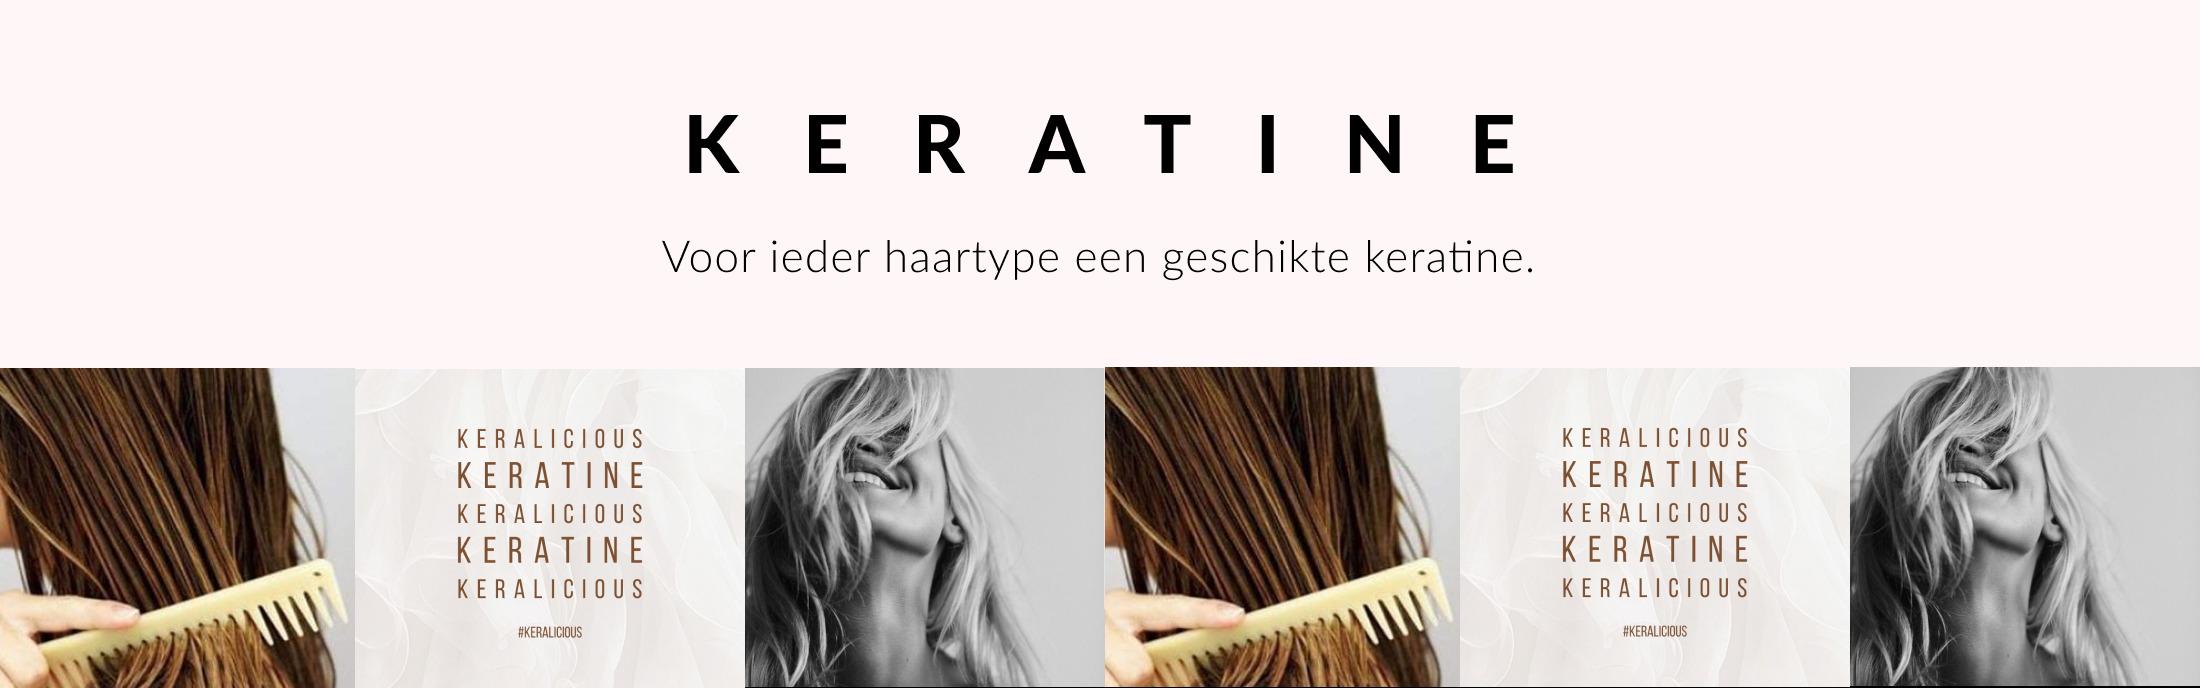 keratine1